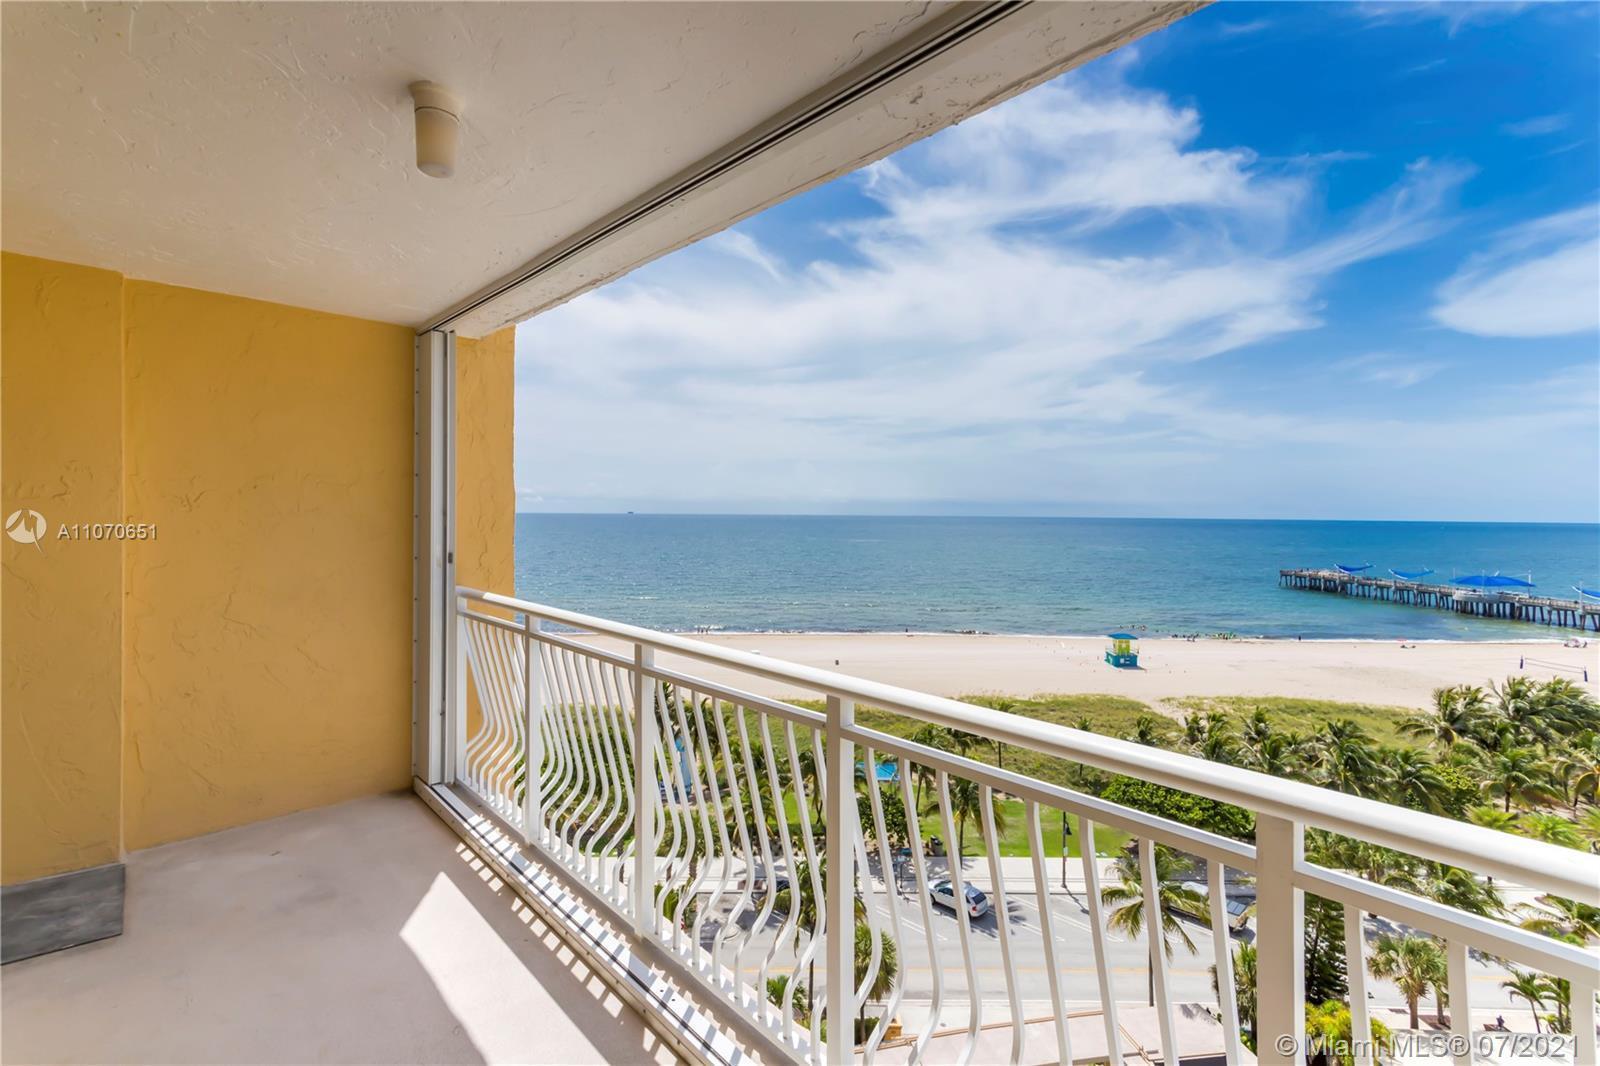 Direct Ocean front, spacious 2BR/2B condo,  located in prime Pompano Beach, in the charming 'Bermuda